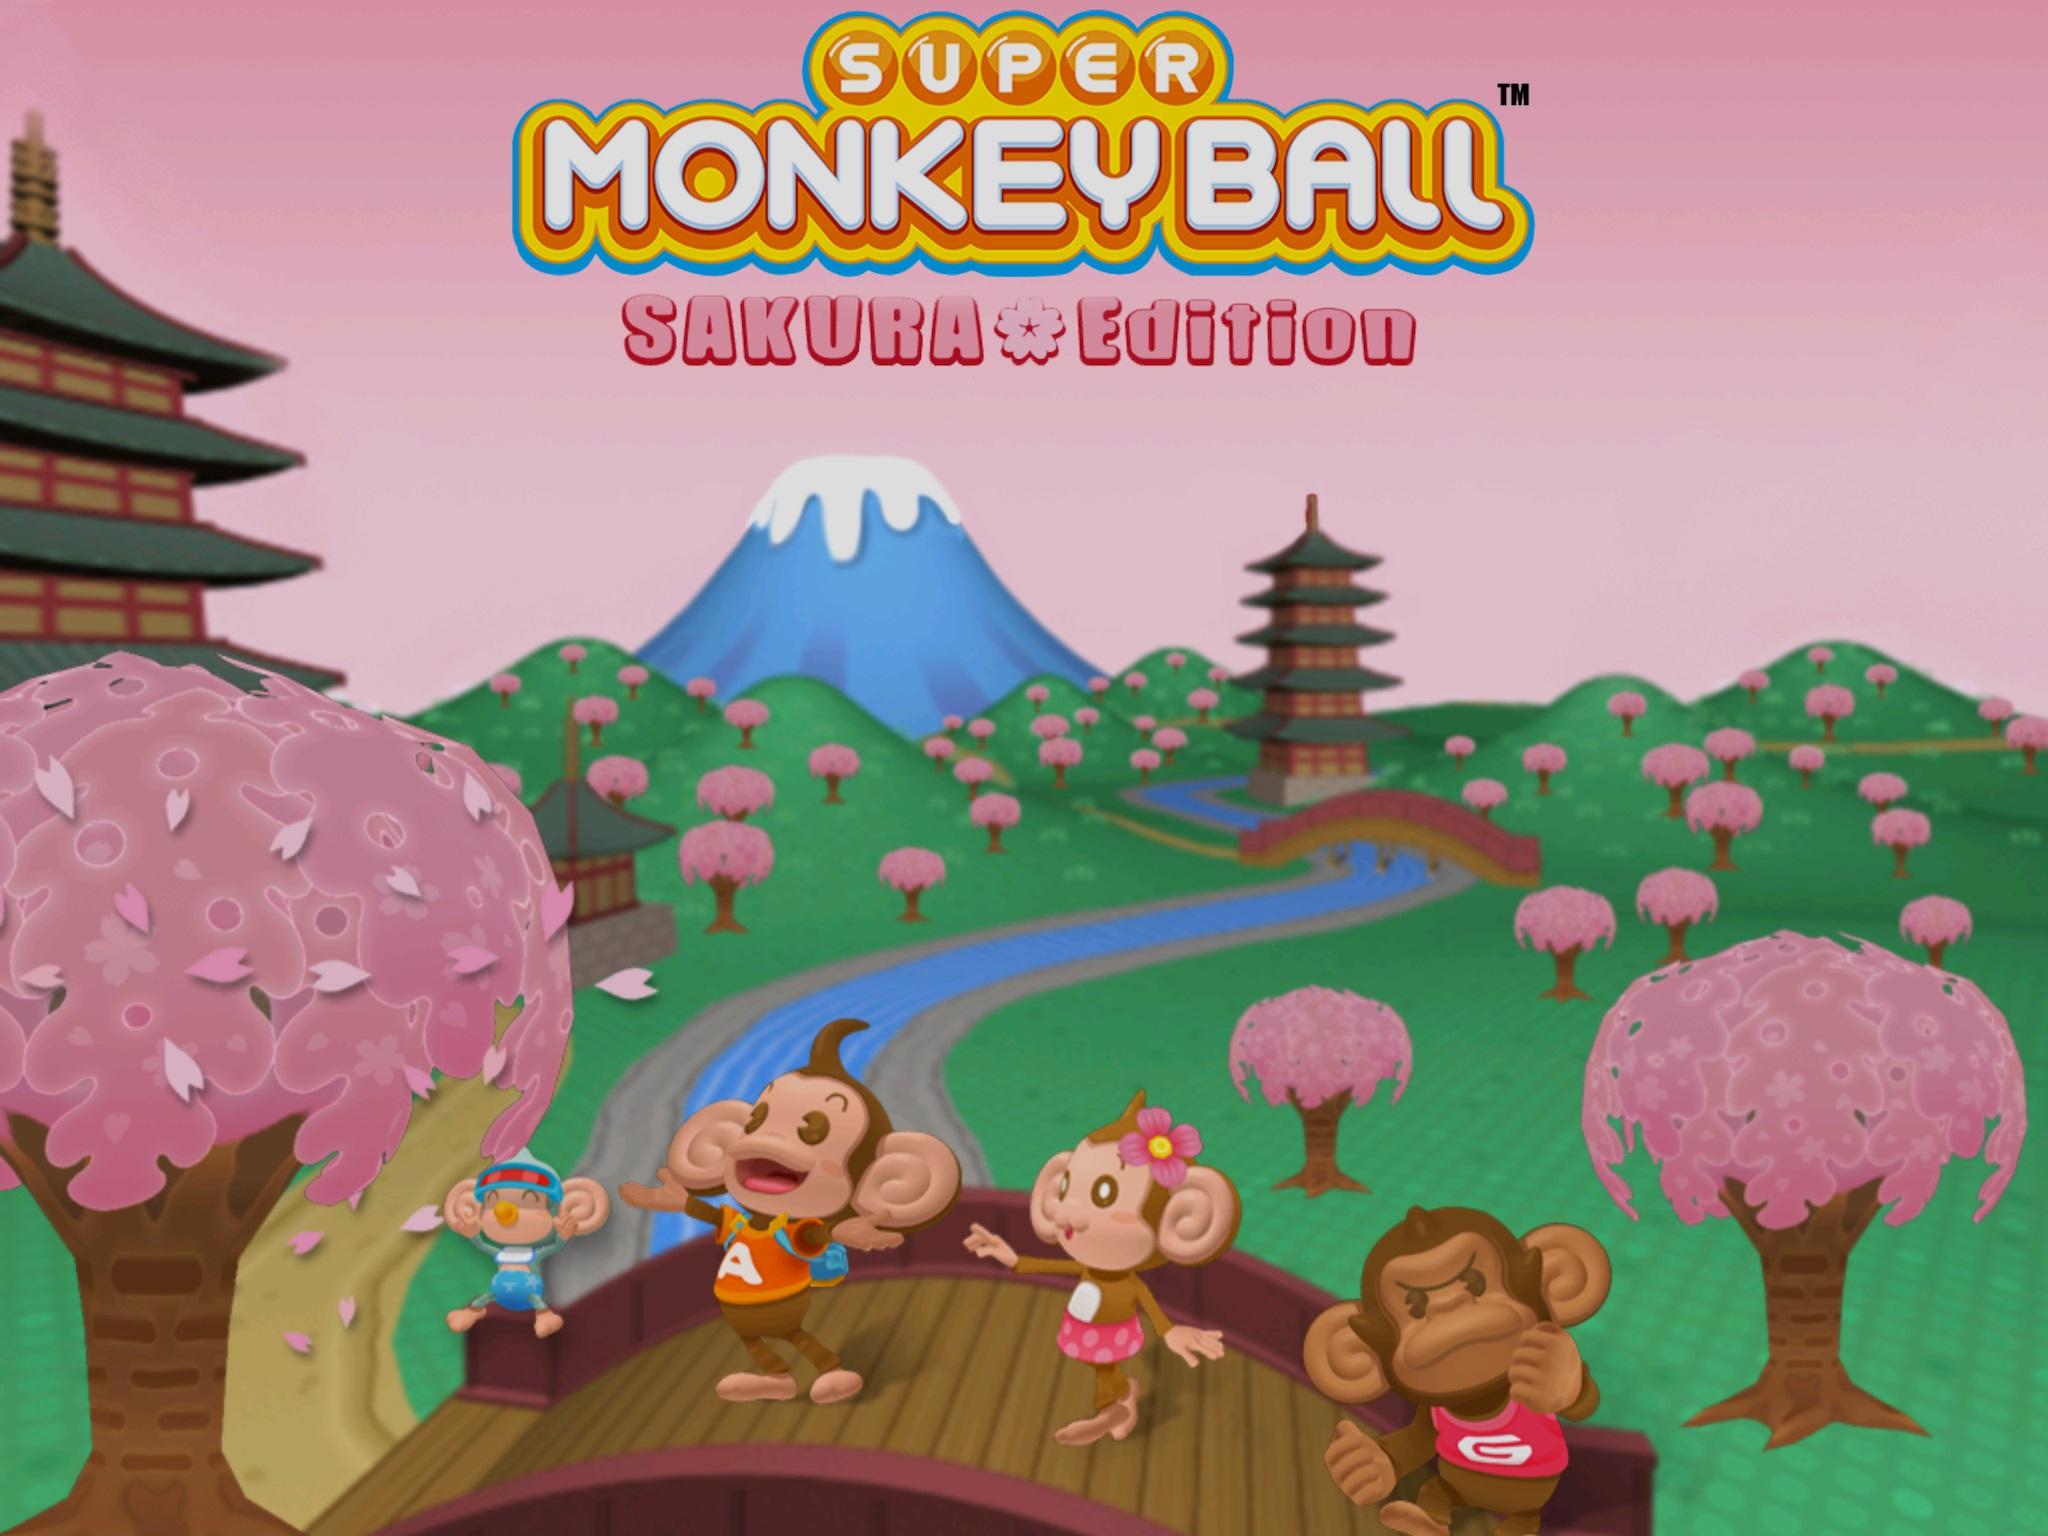 Super Monkey Ball: Sakura Edition joins Sega's free mobile game line-up screenshot